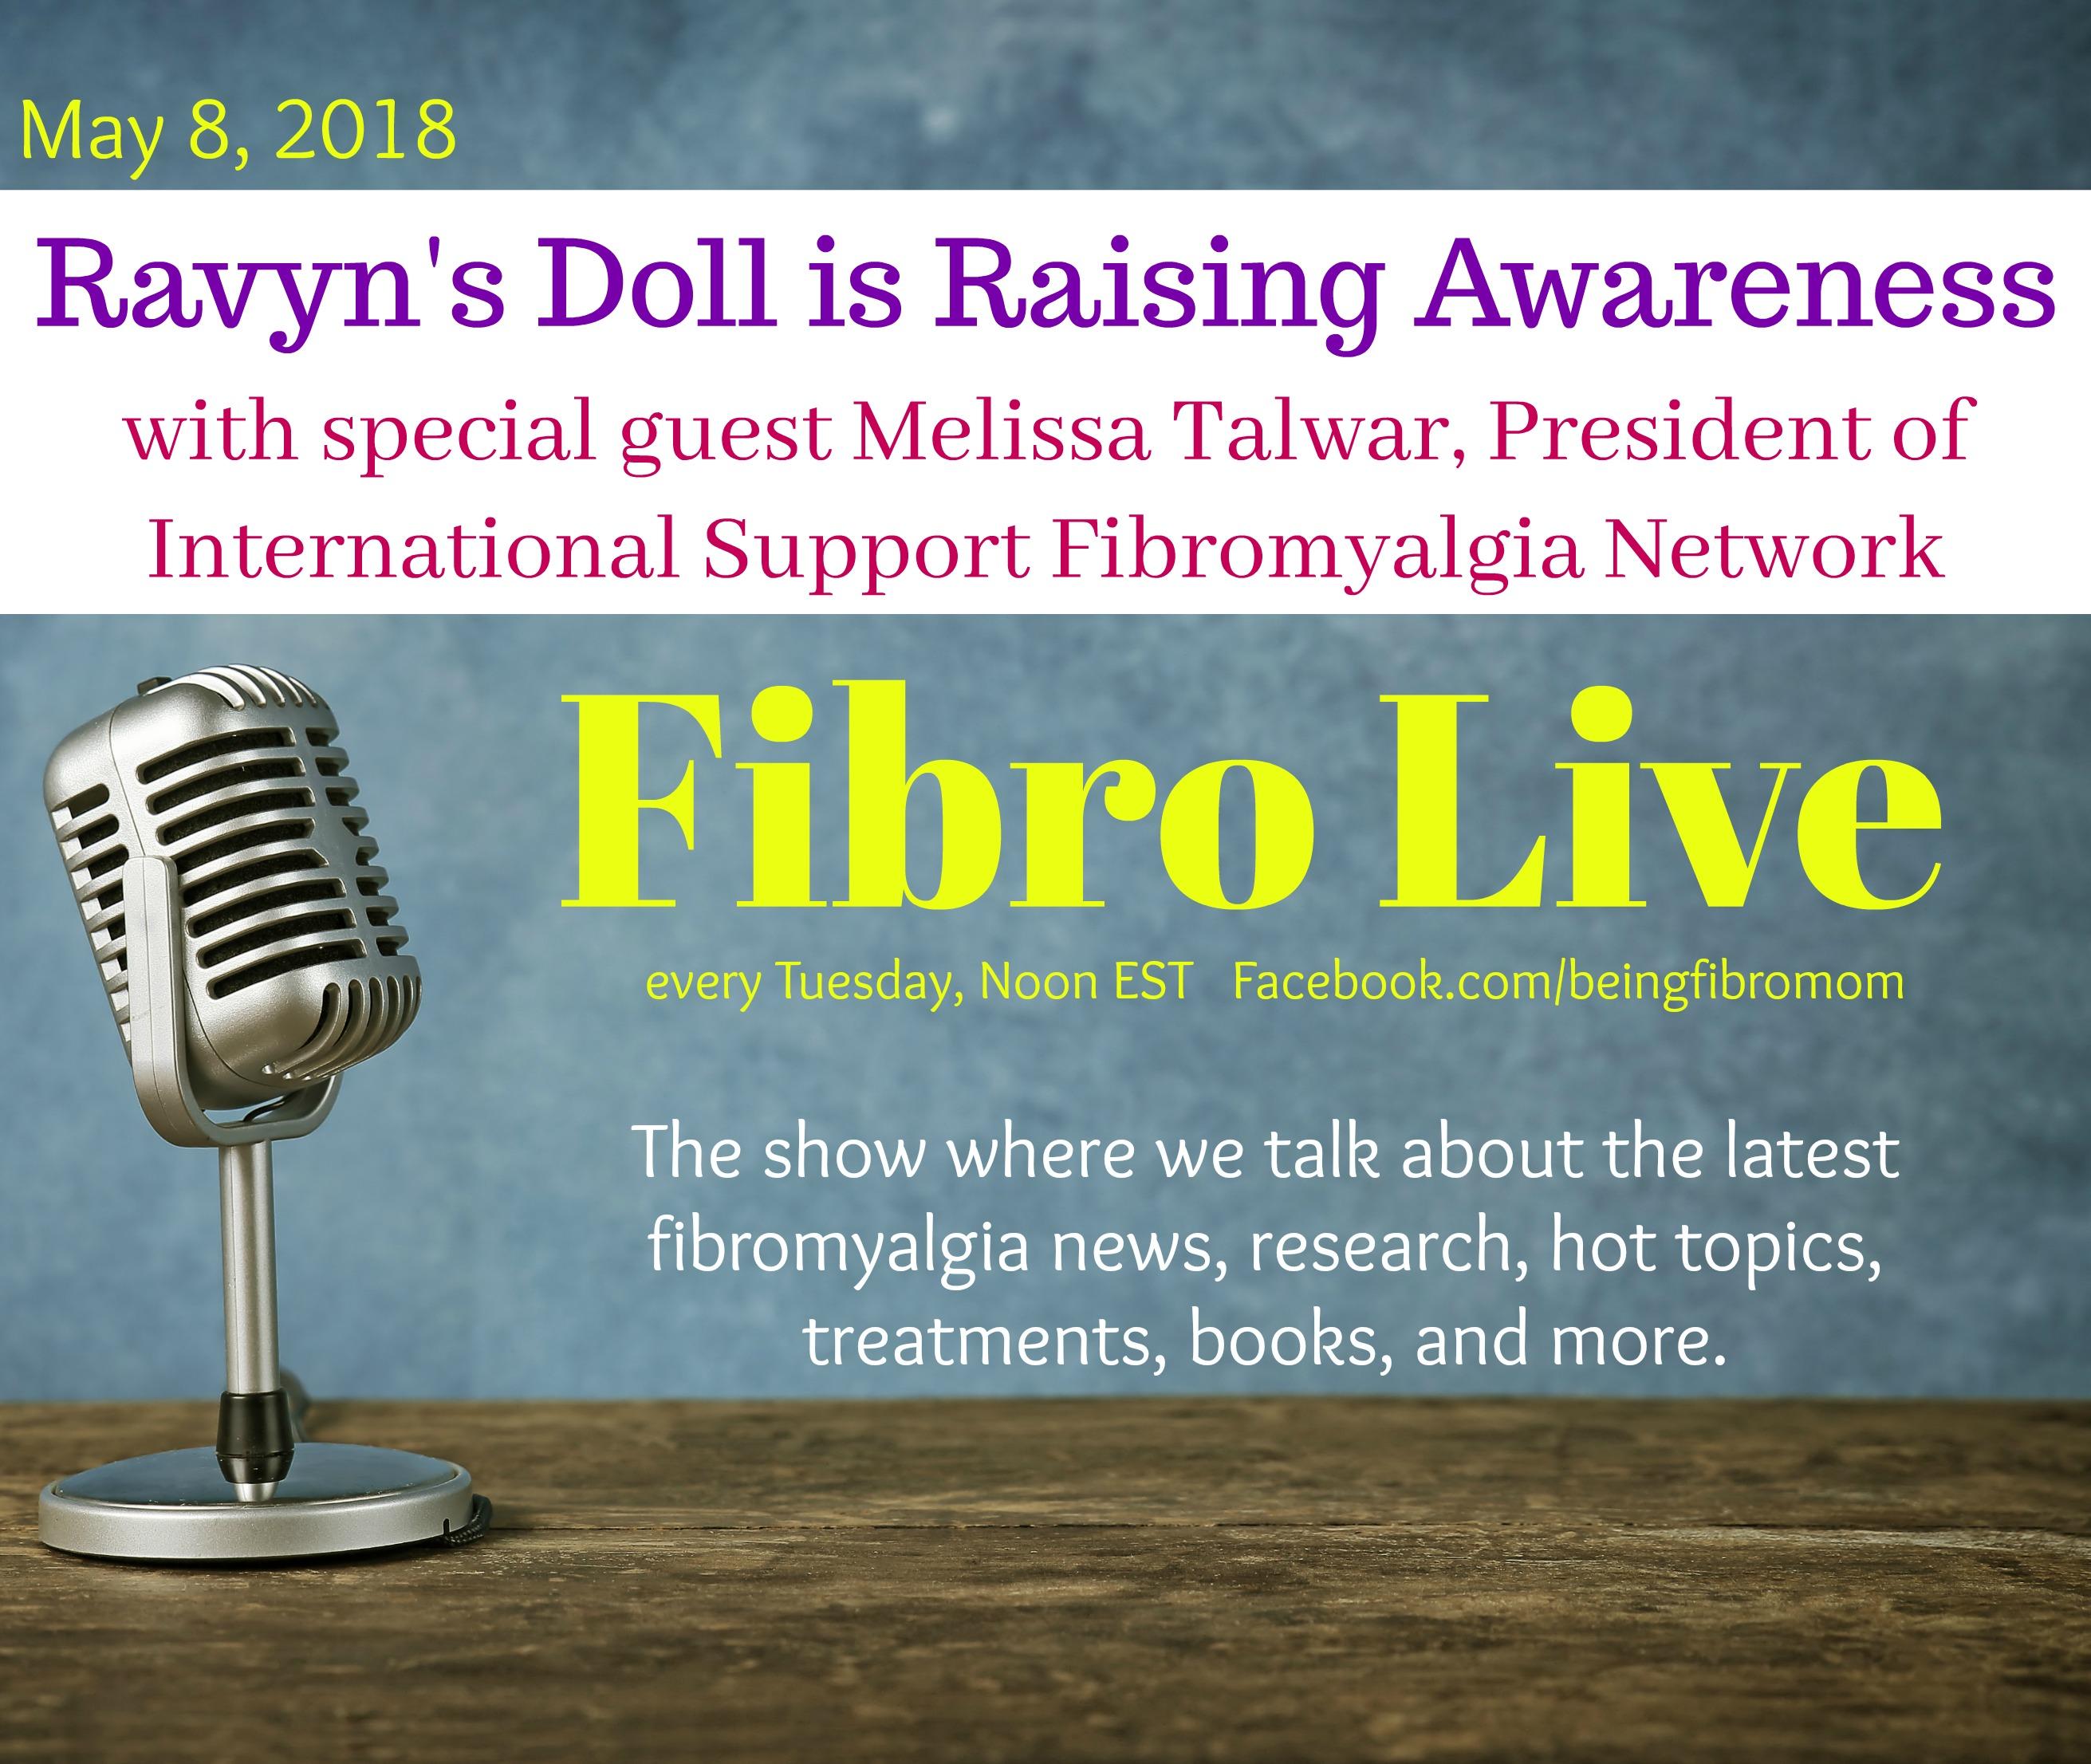 Ravyn's Doll is Spreading Fibromyalgia Awareness {with video}